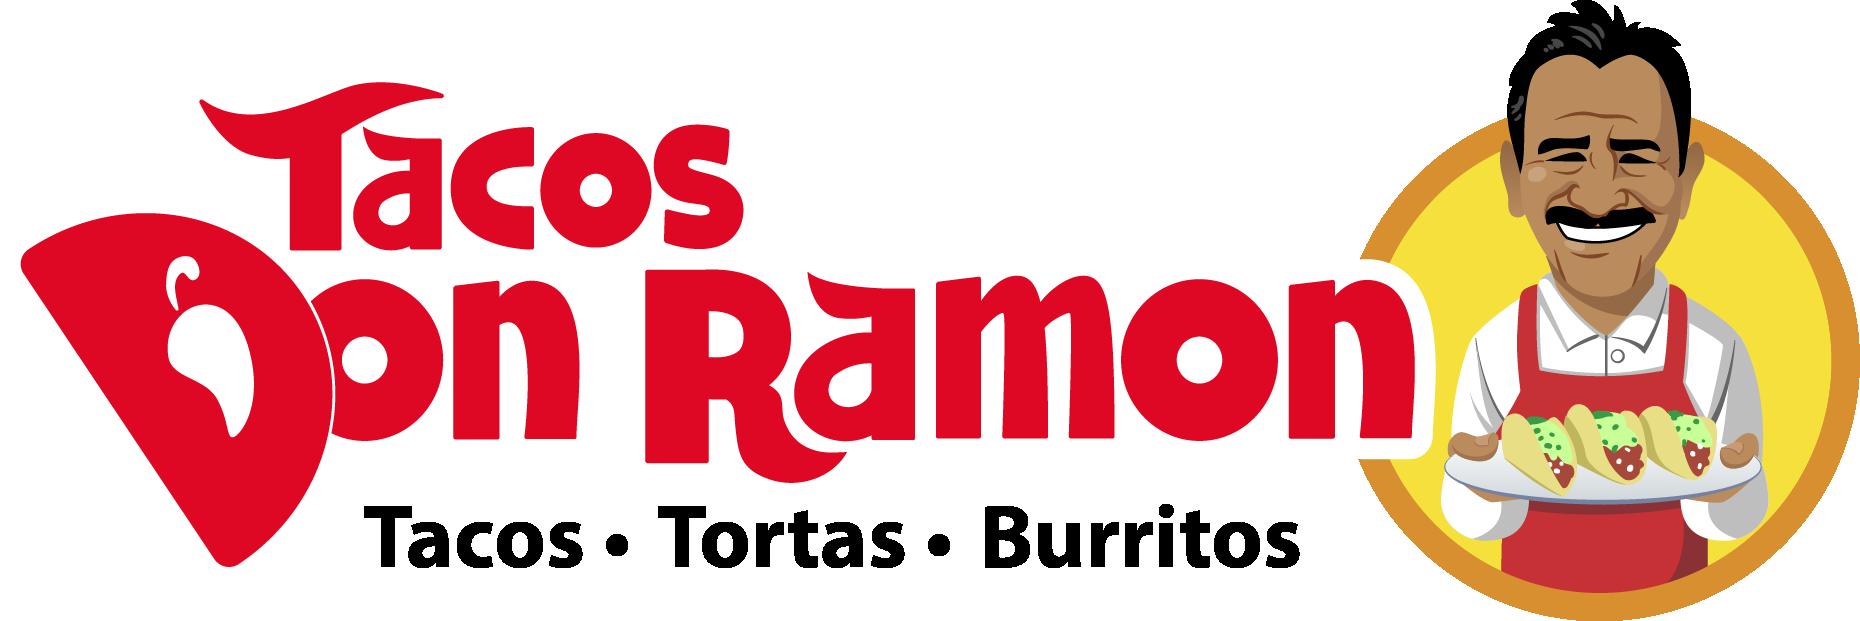 Tacos Don Ramon in San Bernardino, California